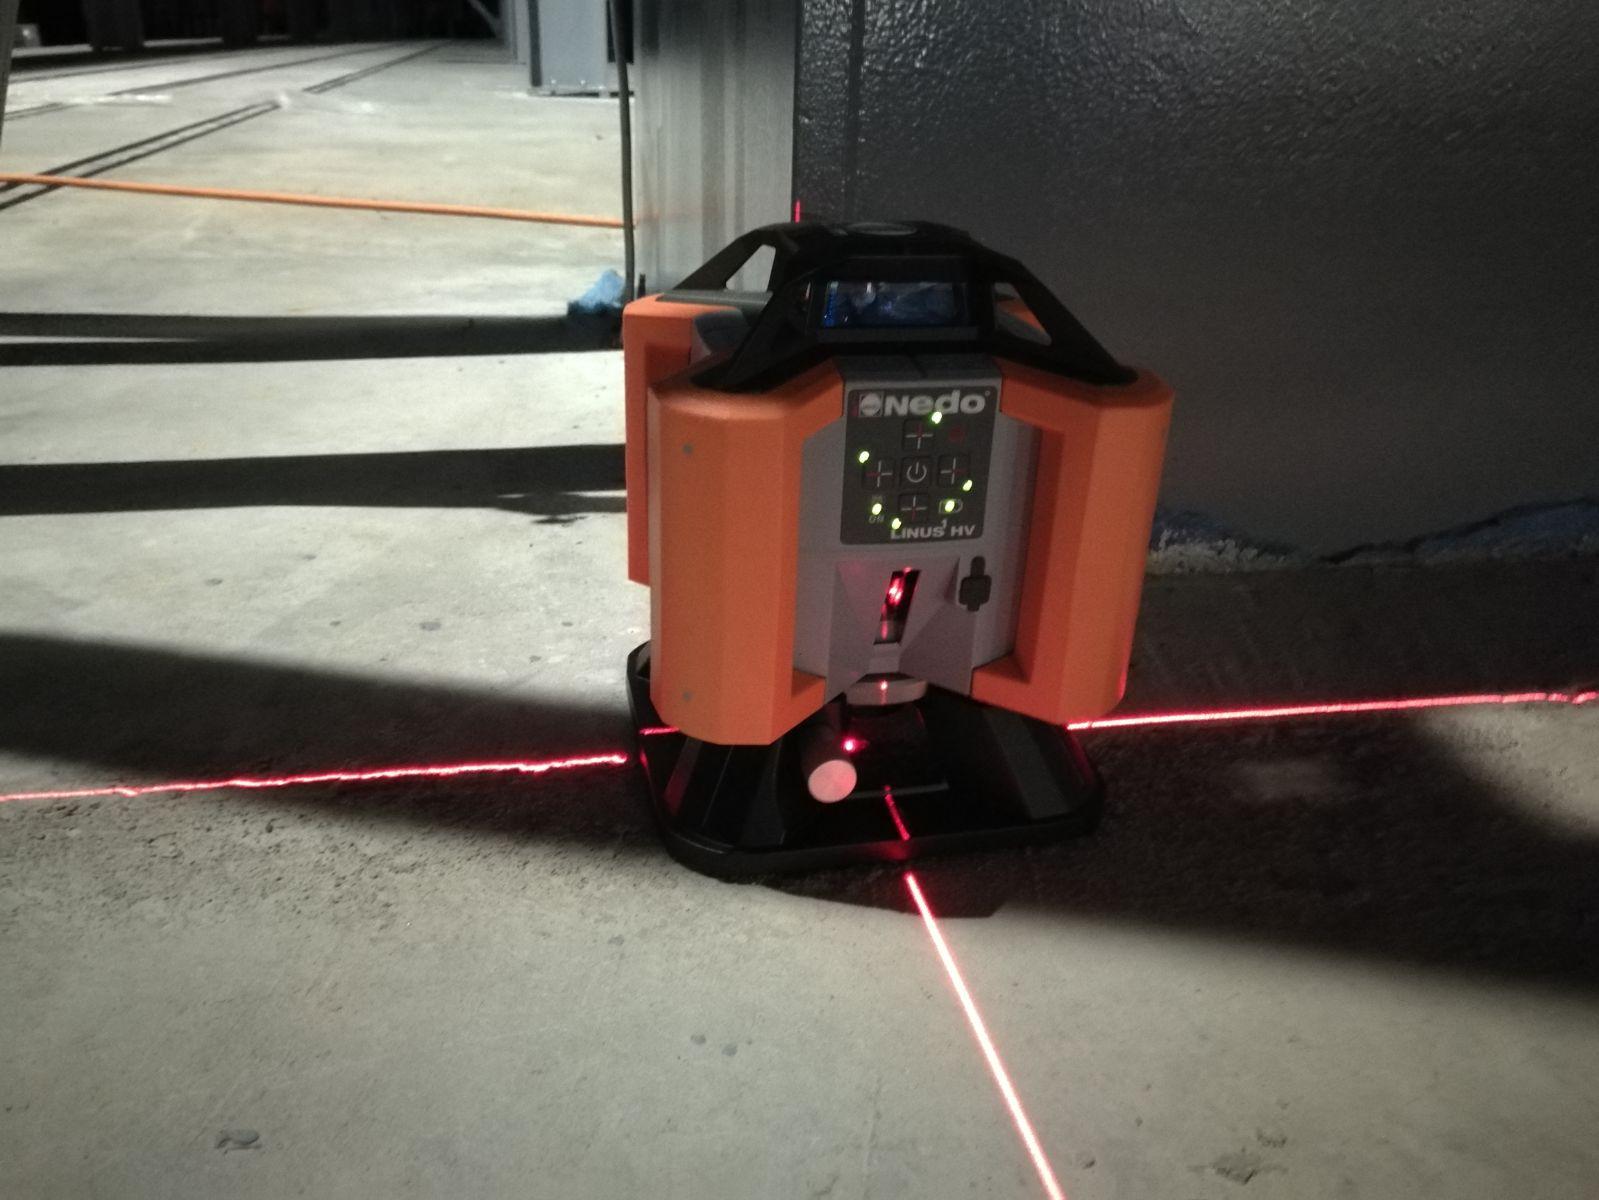 Laser Entfernungsmesser Rechter Winkel : Nedo linus hv universallaser messfreunde